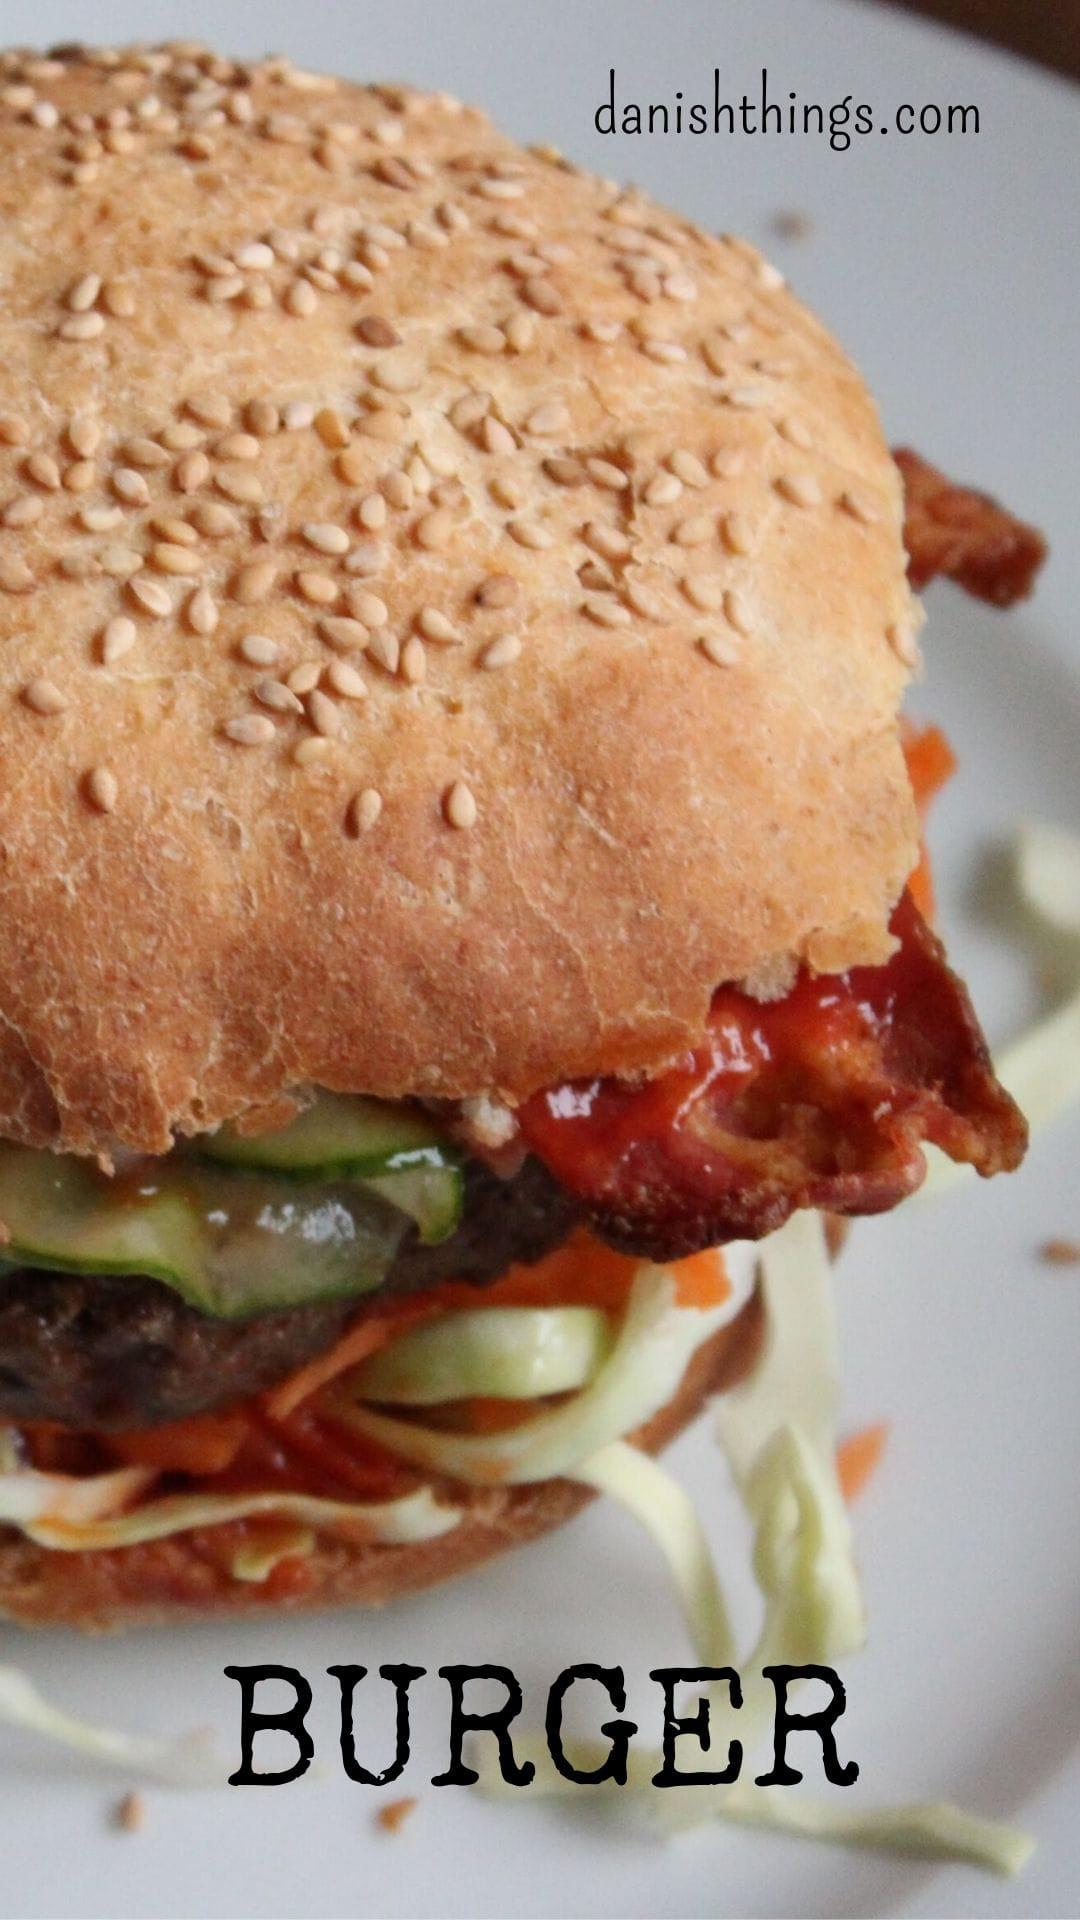 Hjemmelavet burger med nemme hjemmelavede burgerboller og nem lynsyltet agurkesalat. Find opskrifterne på danishthings.com